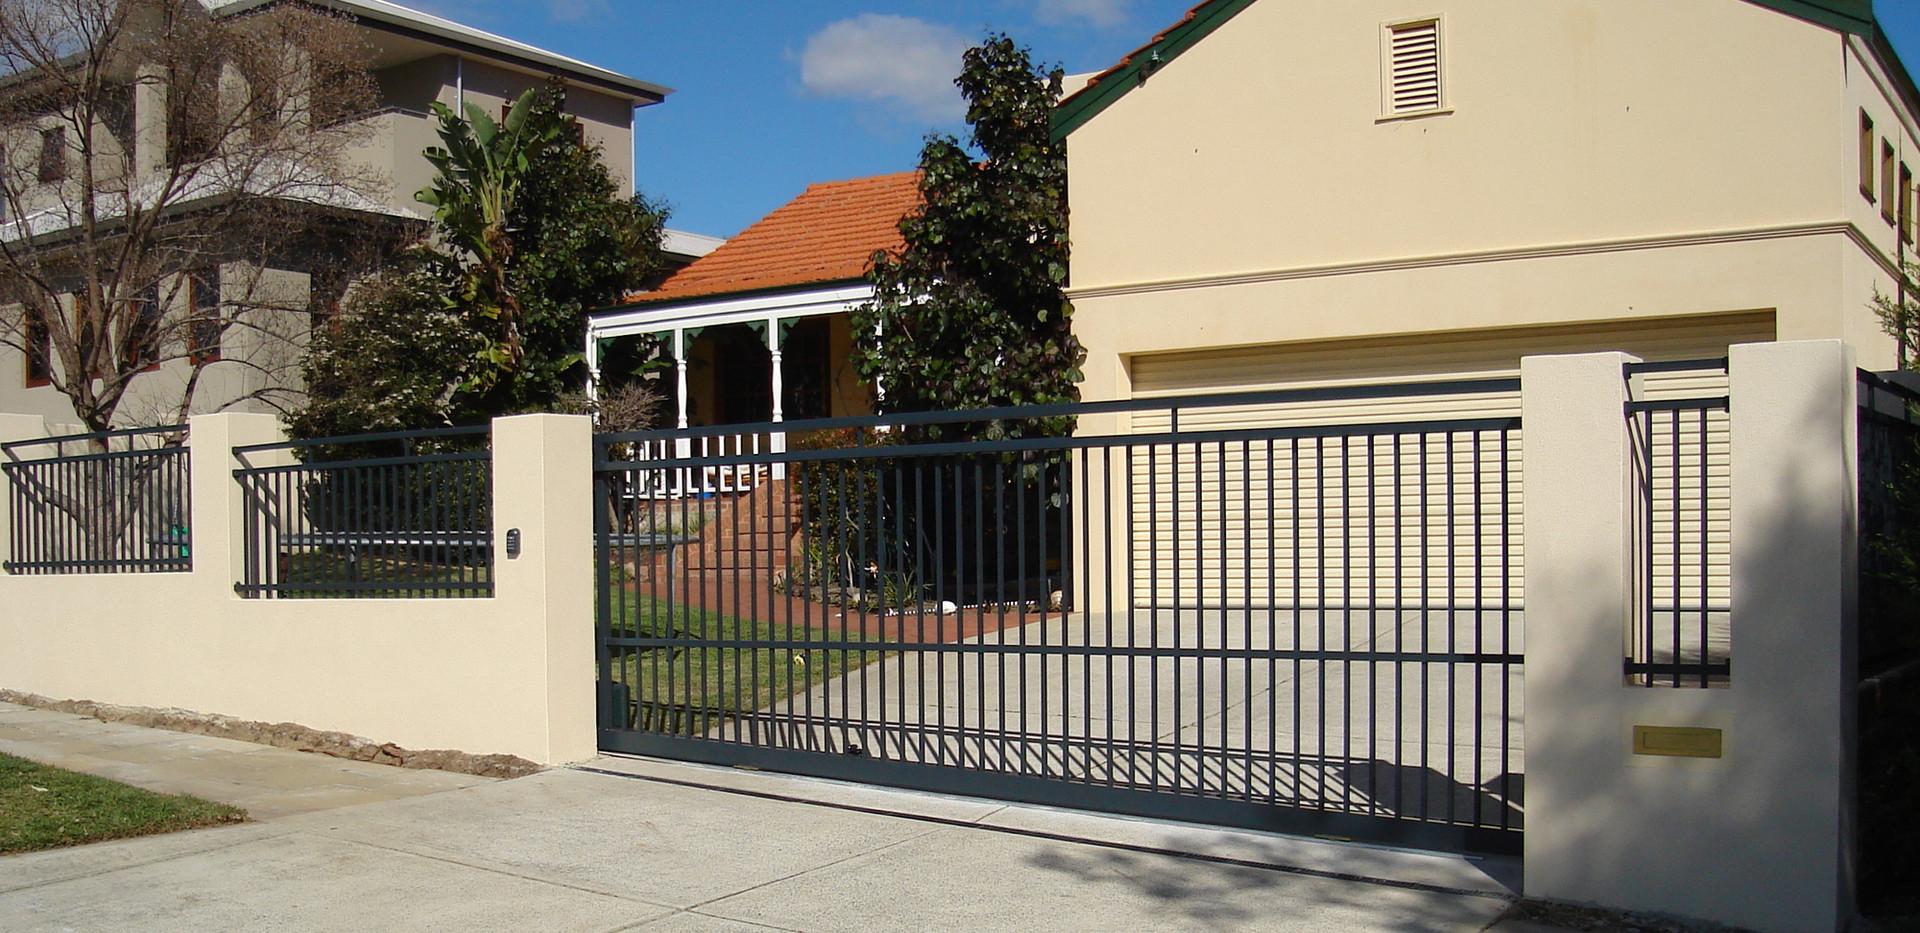 Automatic Gate - Large